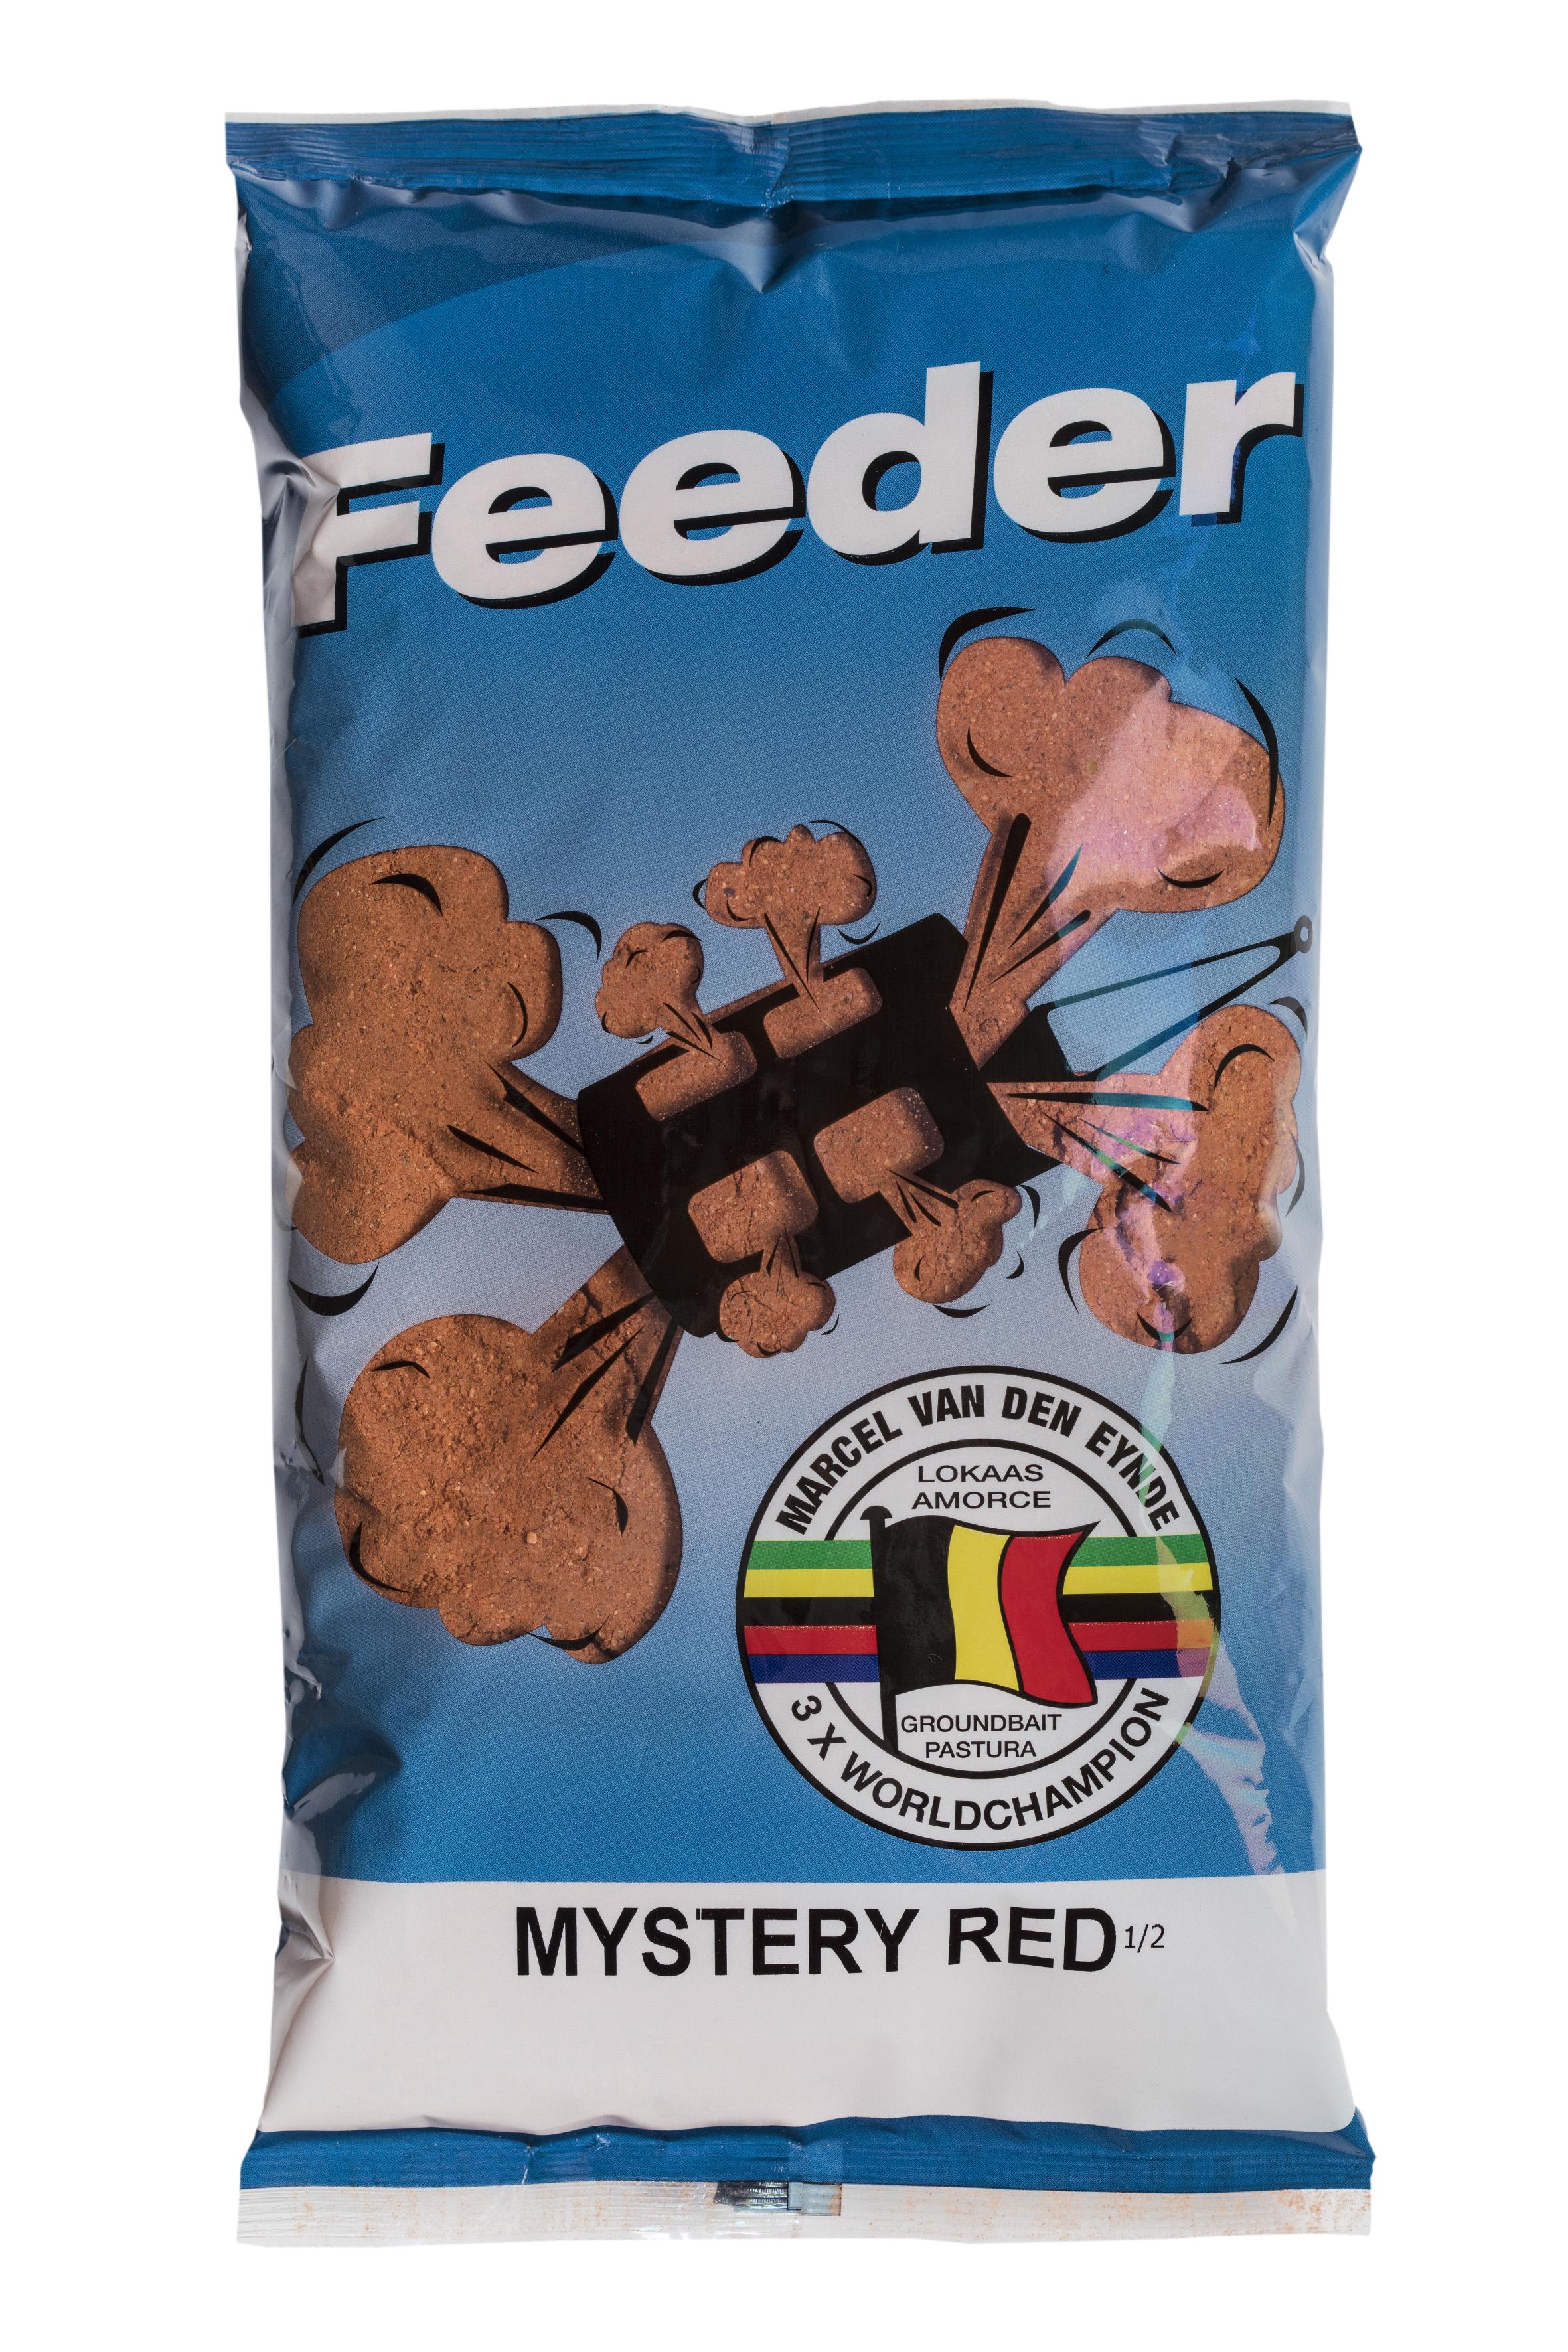 MVDE Feeder Mystery Red (1kg)